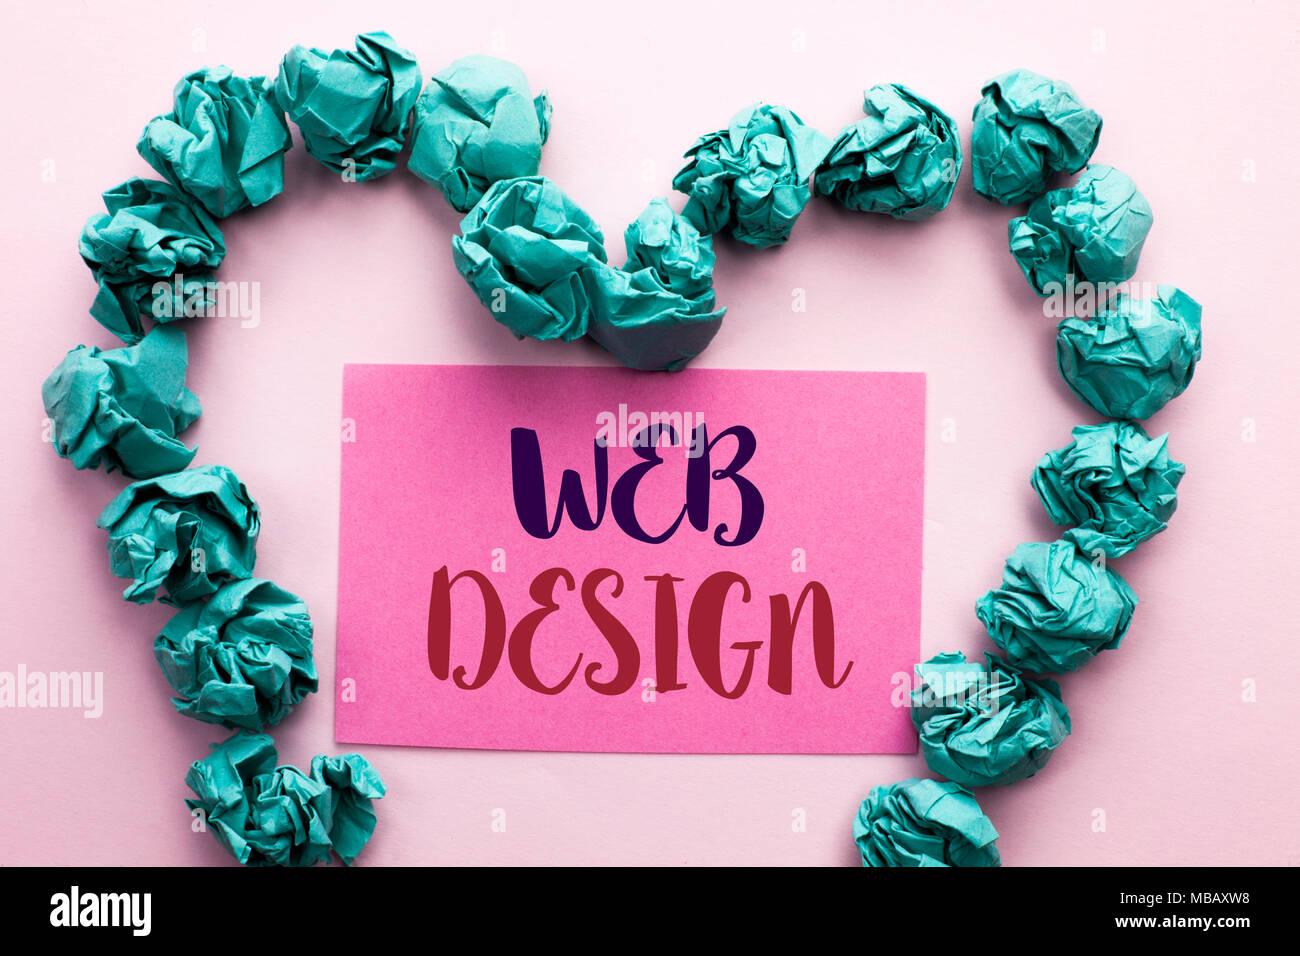 Responsive Web Design Word Concept Stockfotos & Responsive Web ...